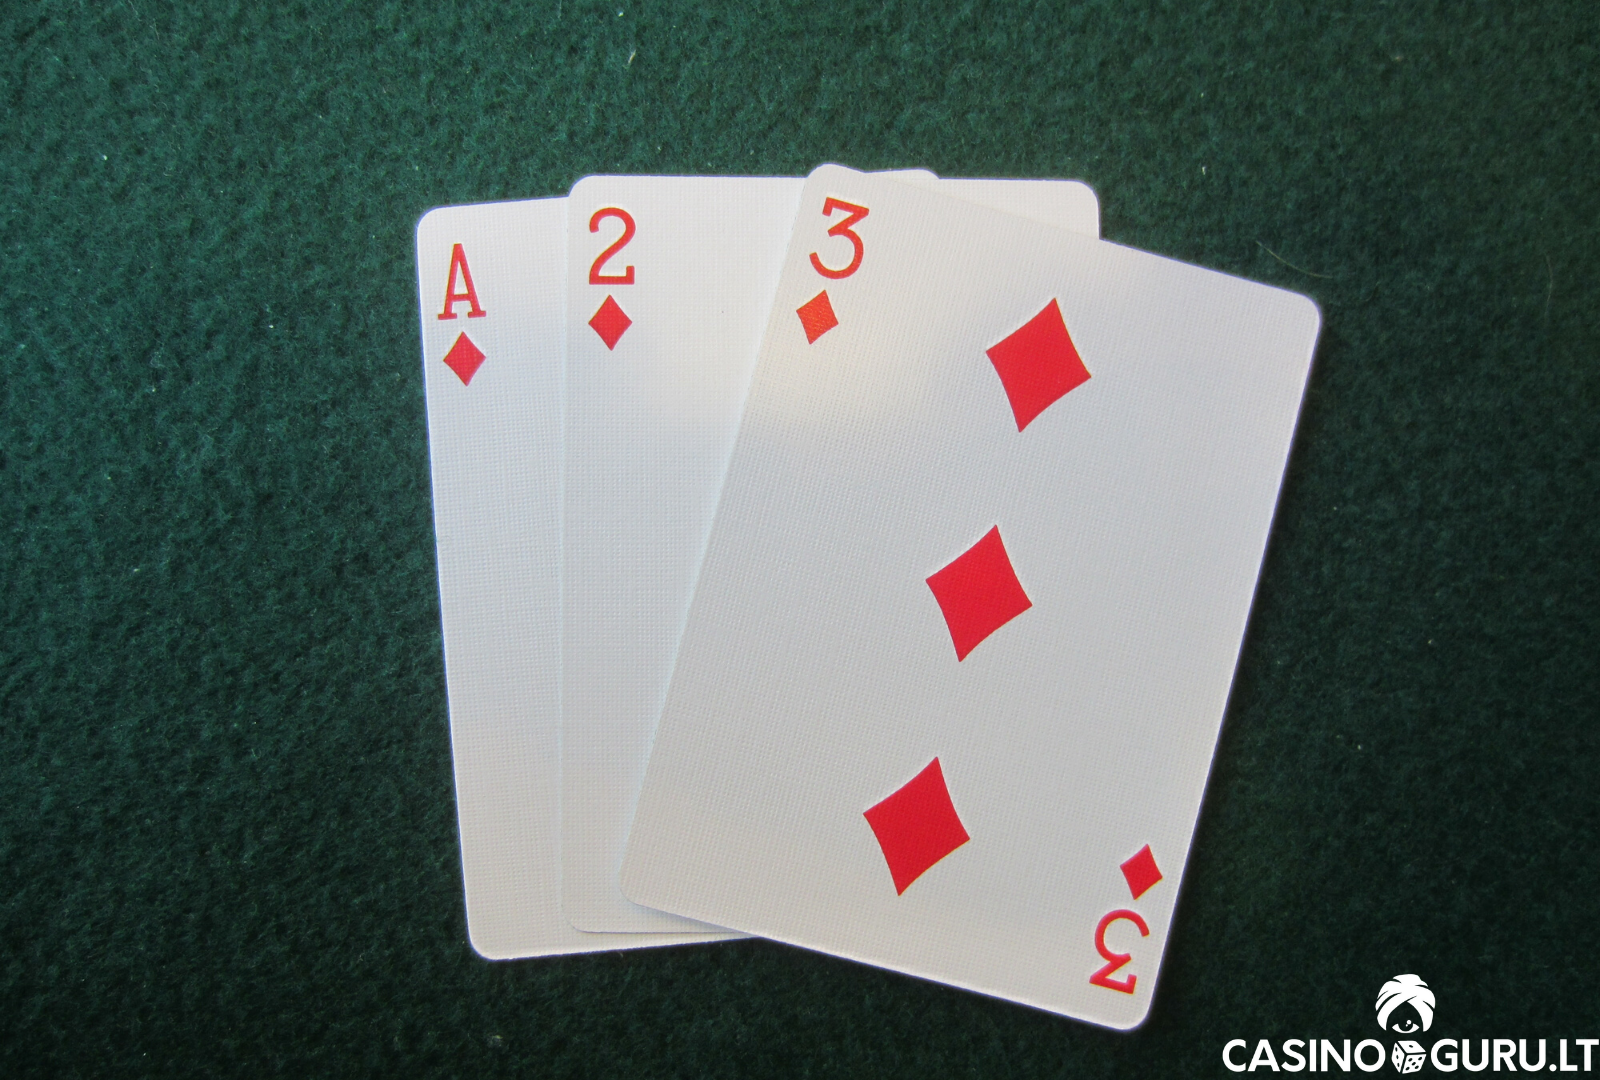 3 card brag zaidimas - ace 2 3